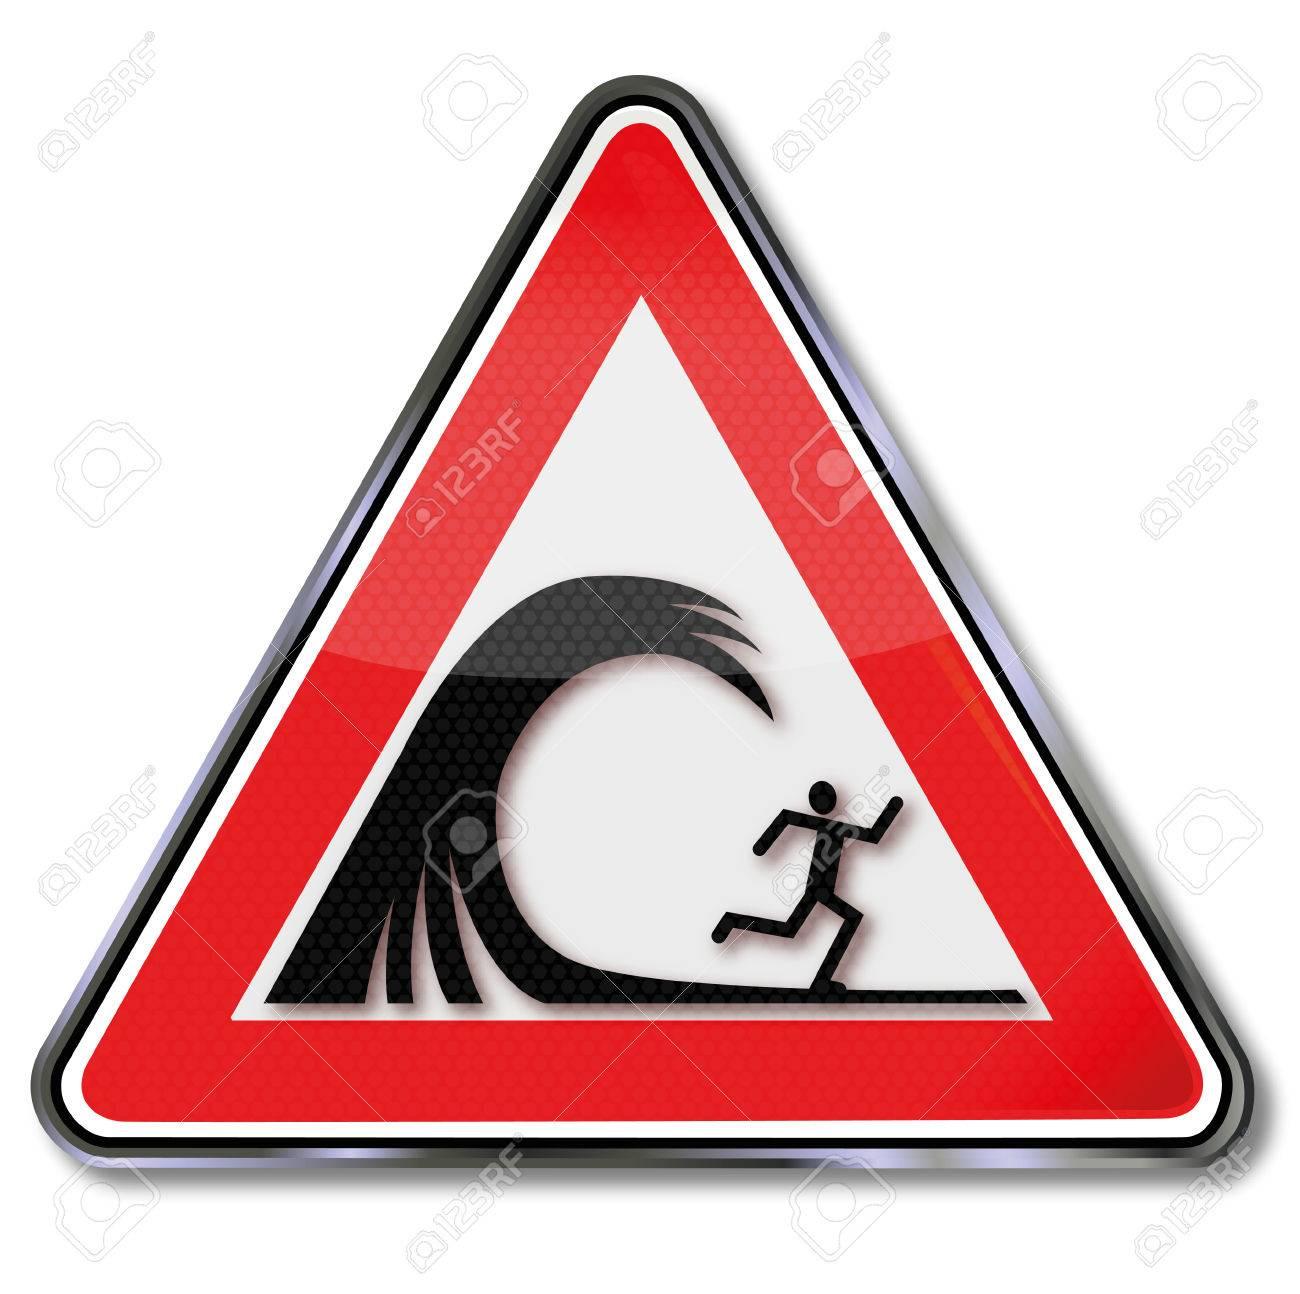 Warning sign riptide Stock Vector - 22806432